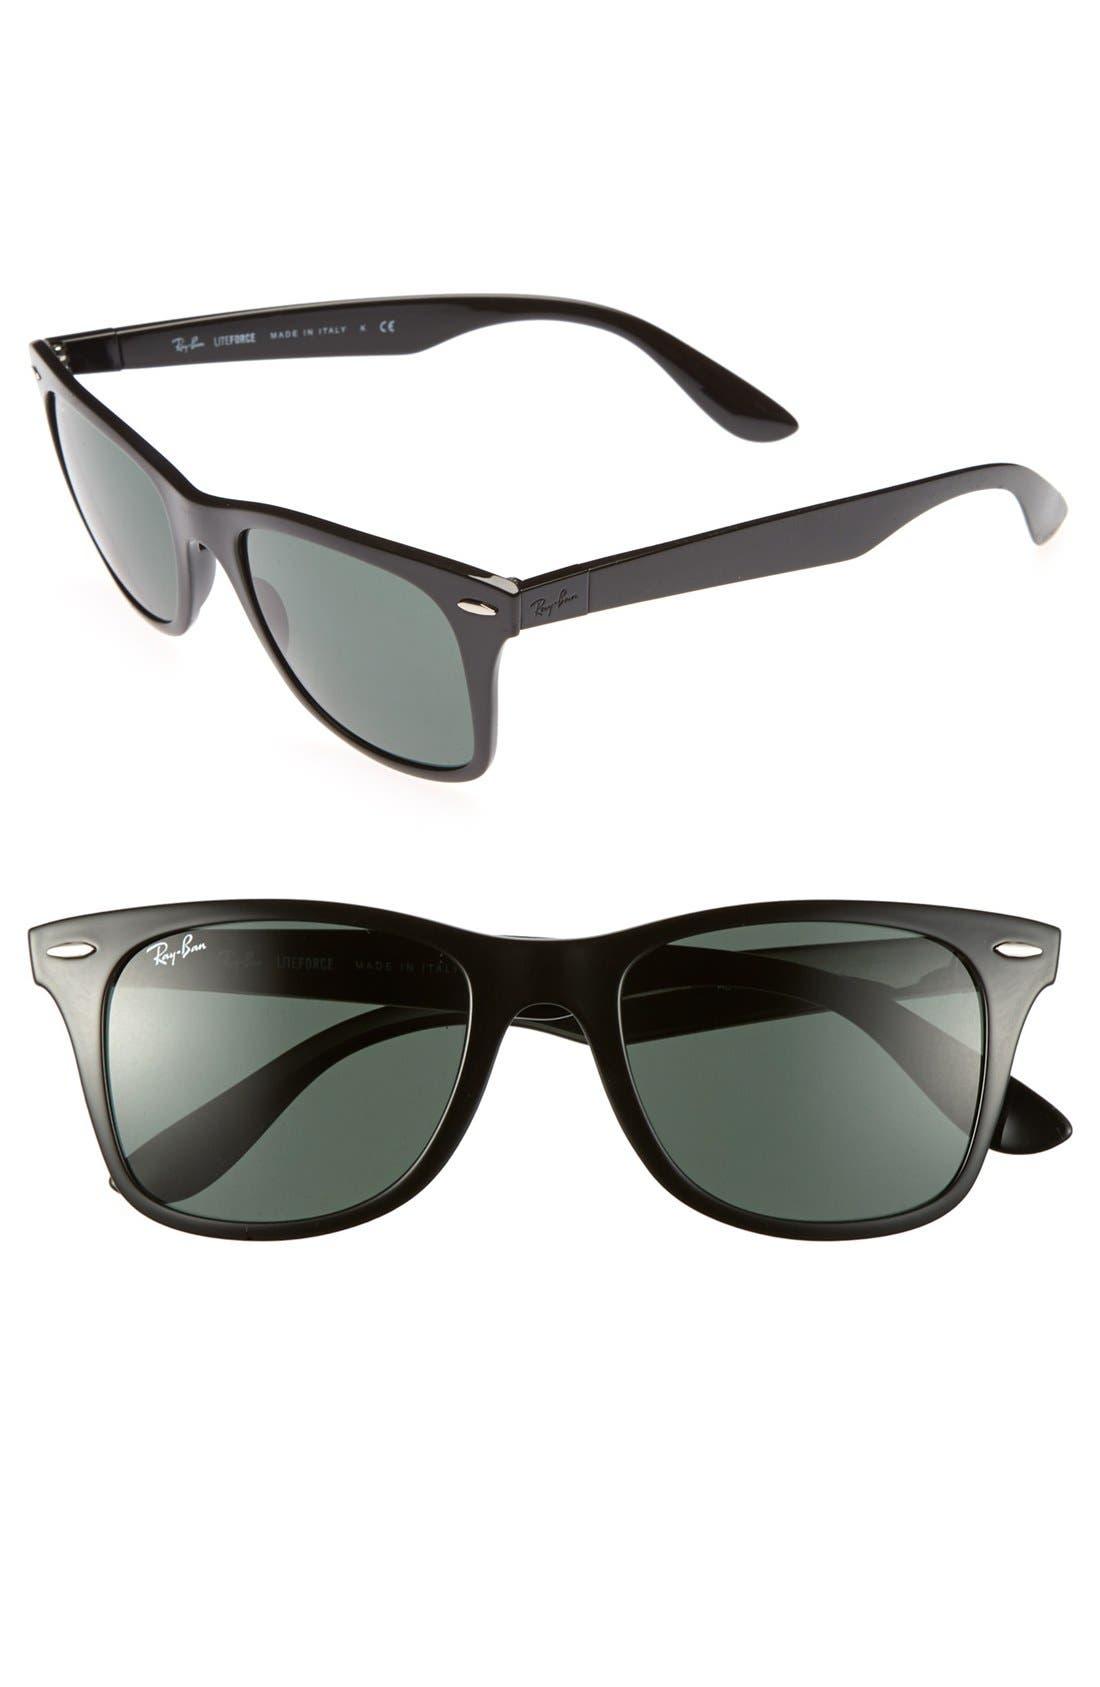 Main Image - Ray-Ban 'TECH Liteforce - Wayfarer' Sunglasses